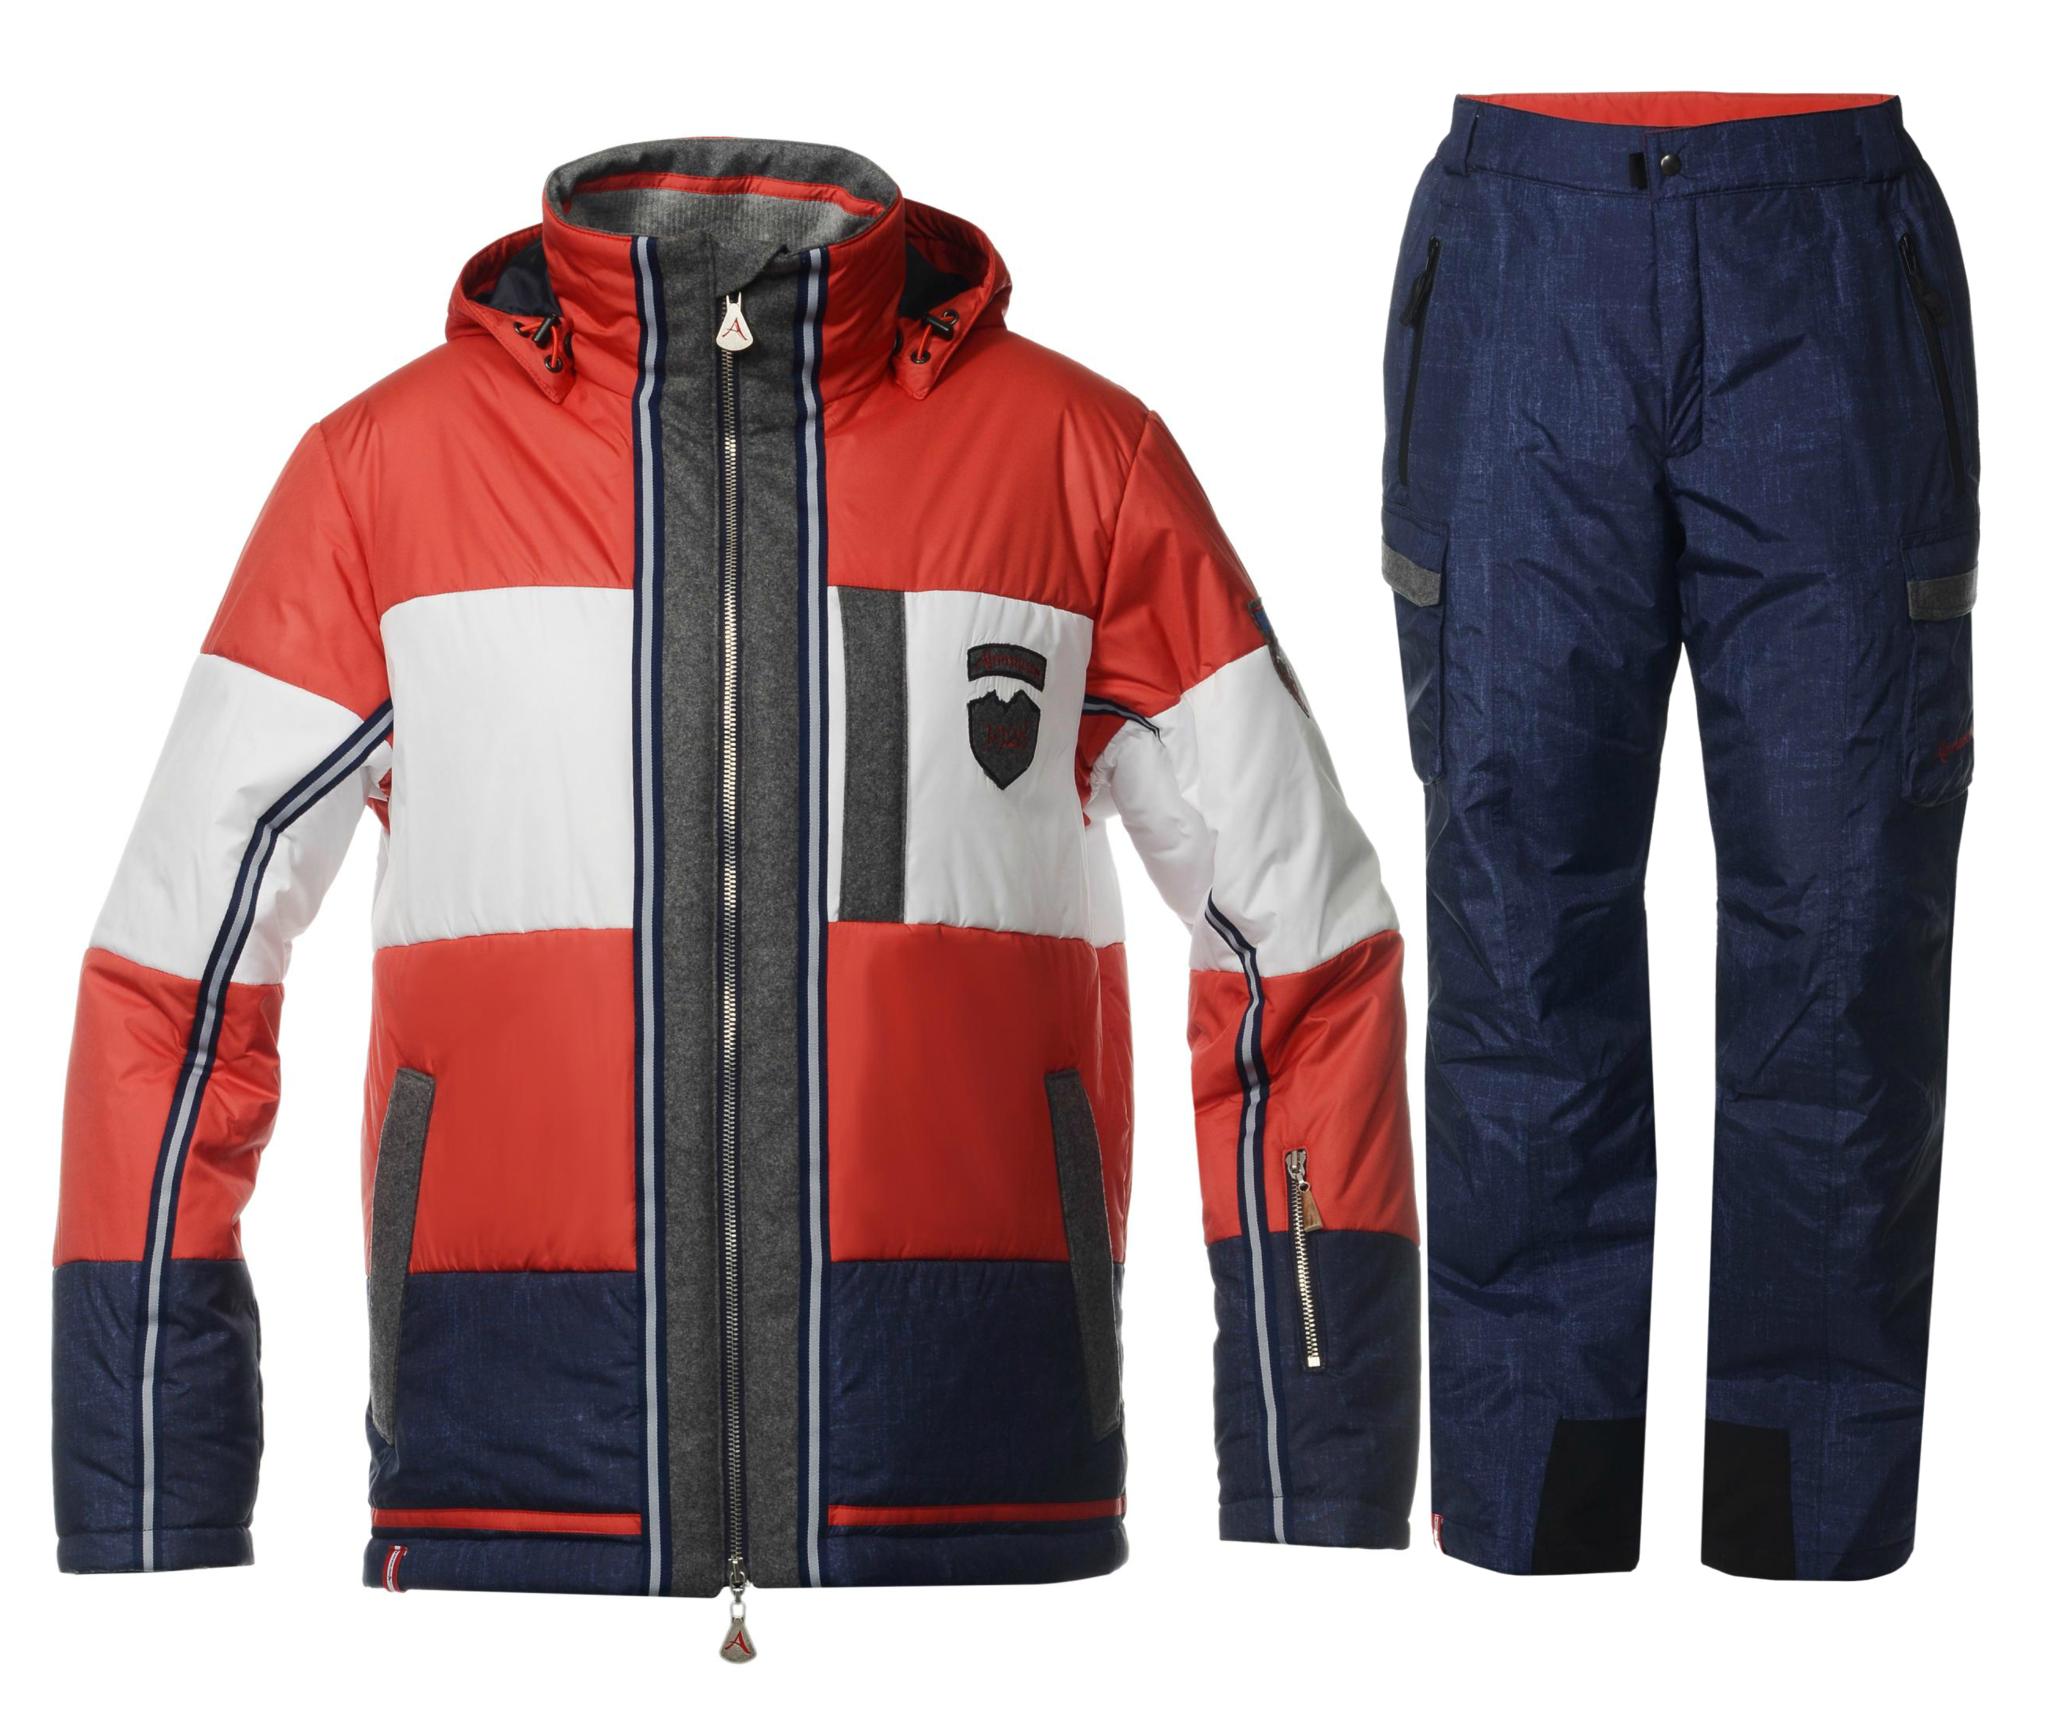 Мужской горнолыжный костюм Almrausch Steinpass-Hochbruck 320109-321300 красный фото